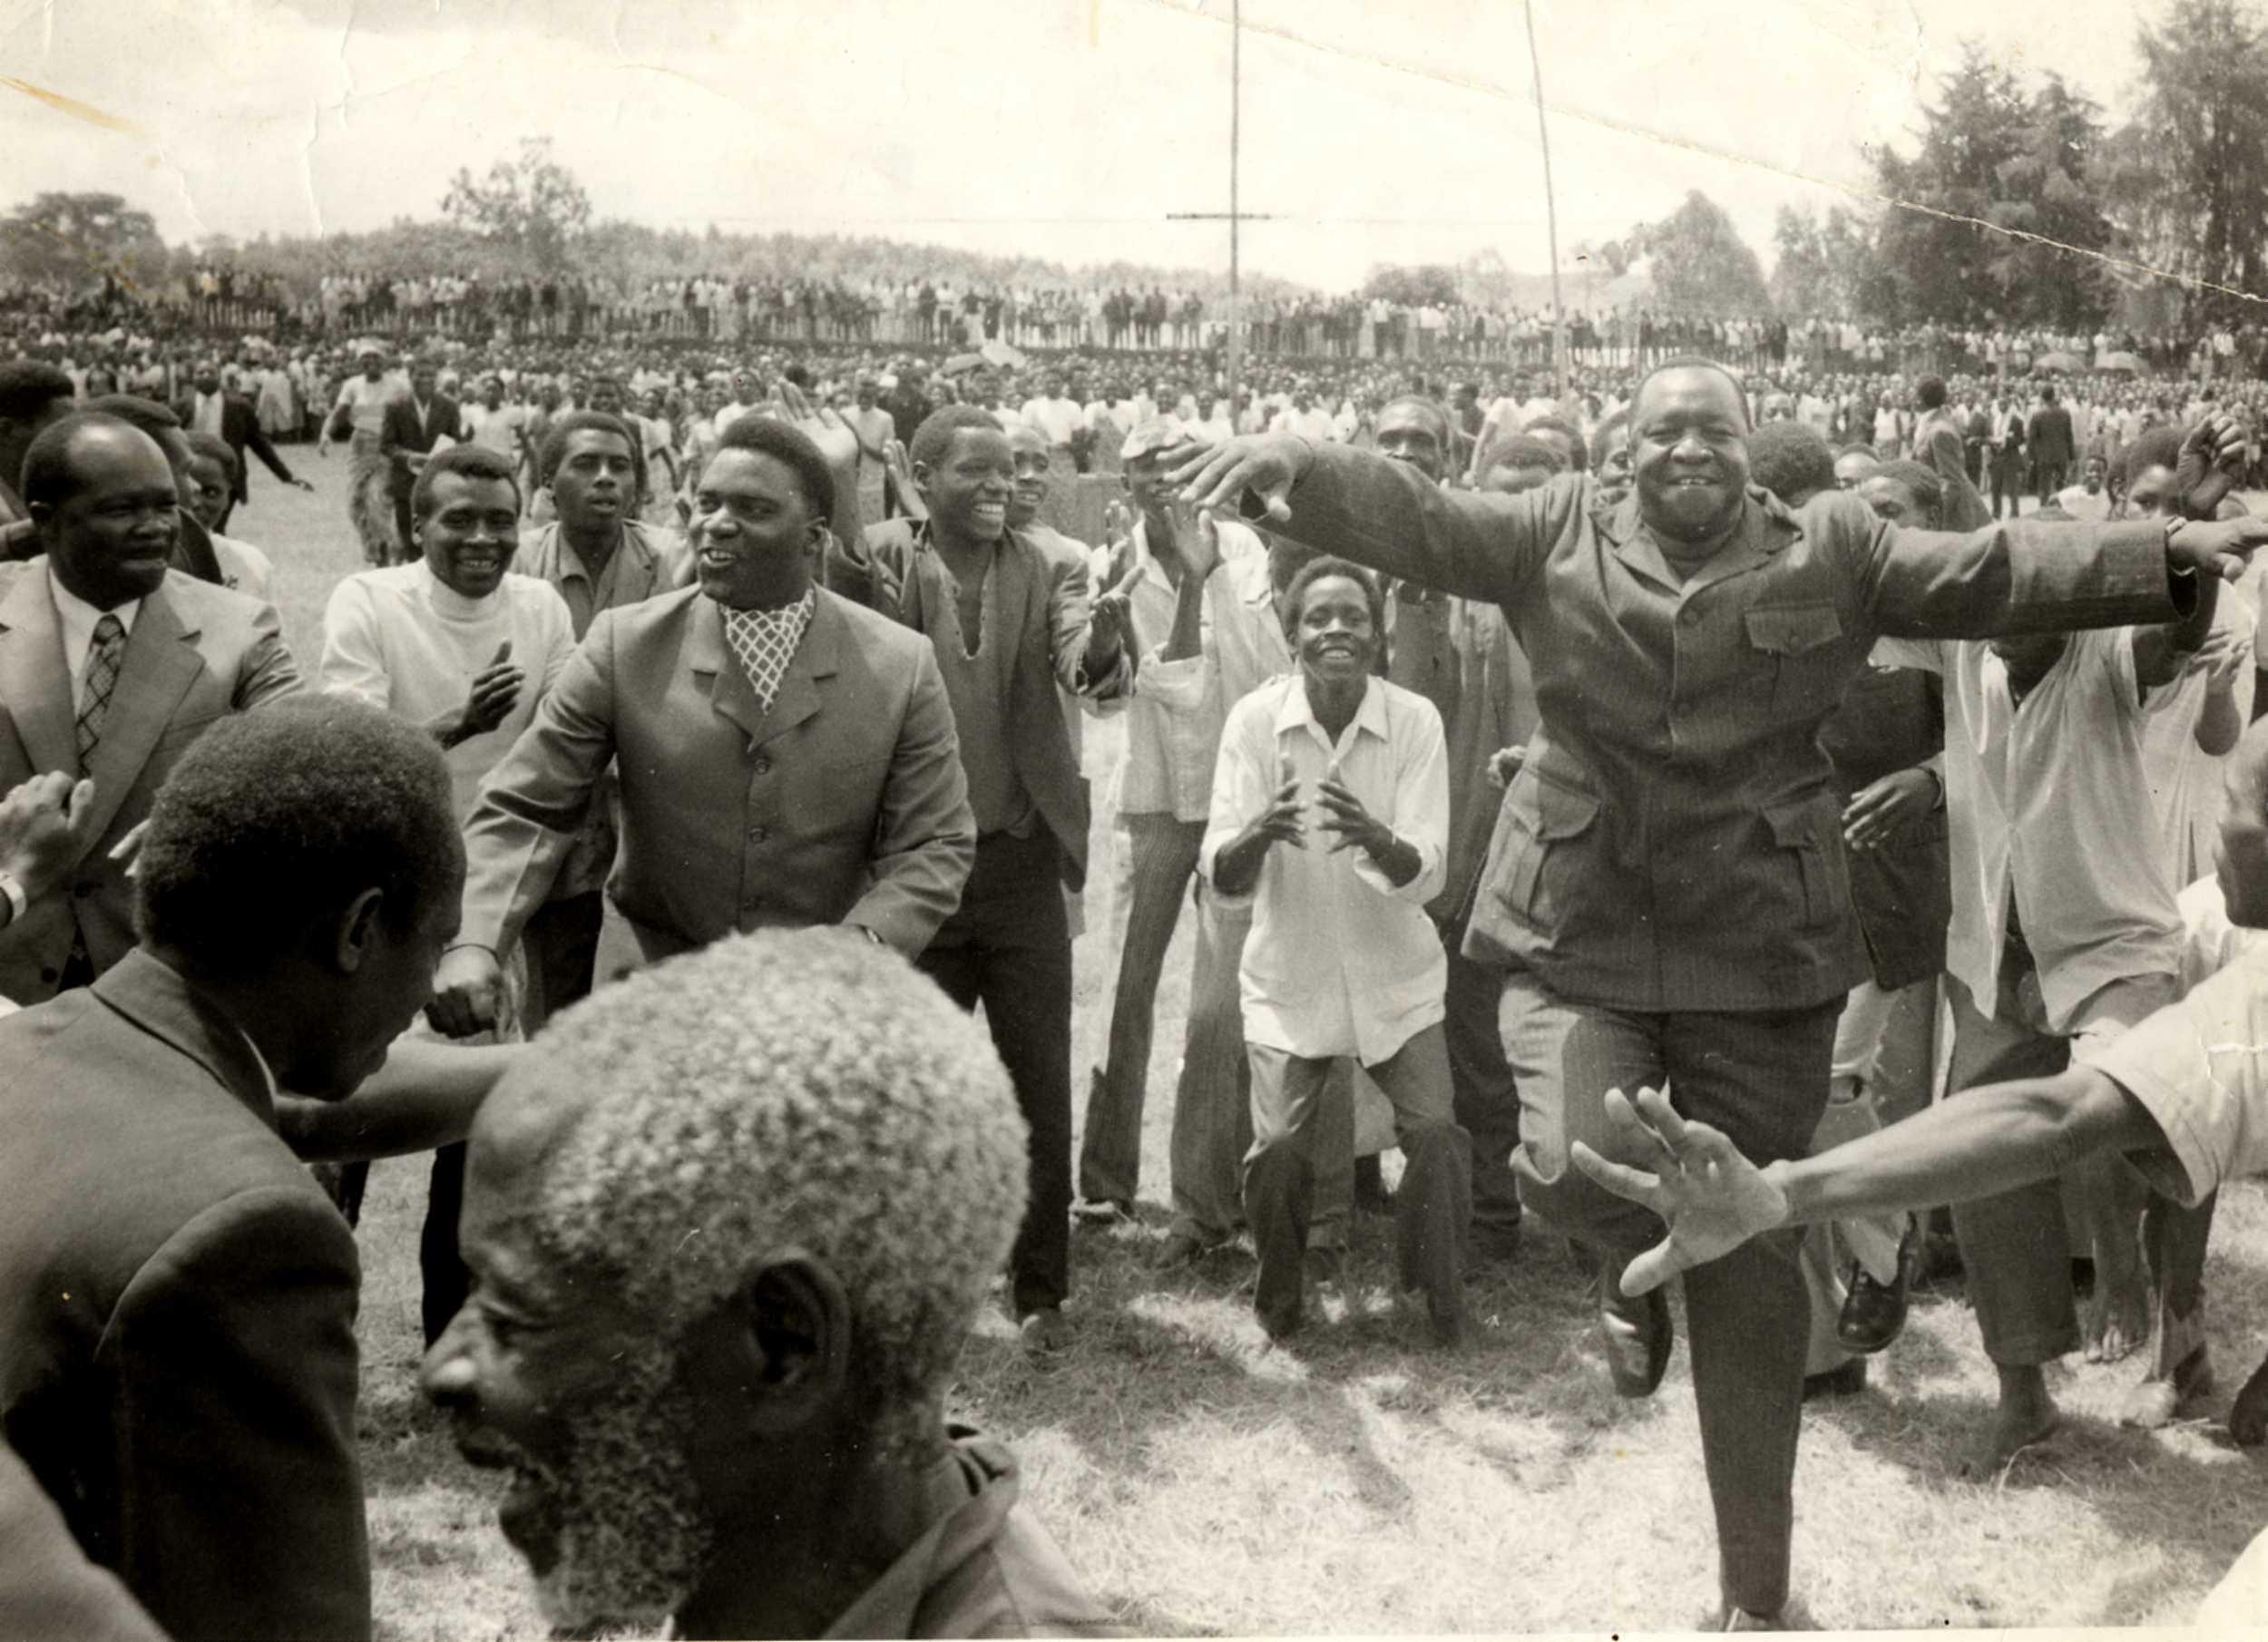 Idi Amin dancing with his fellow dictator, Rwanda's Juvénal Habyarimana. (The New Vision)